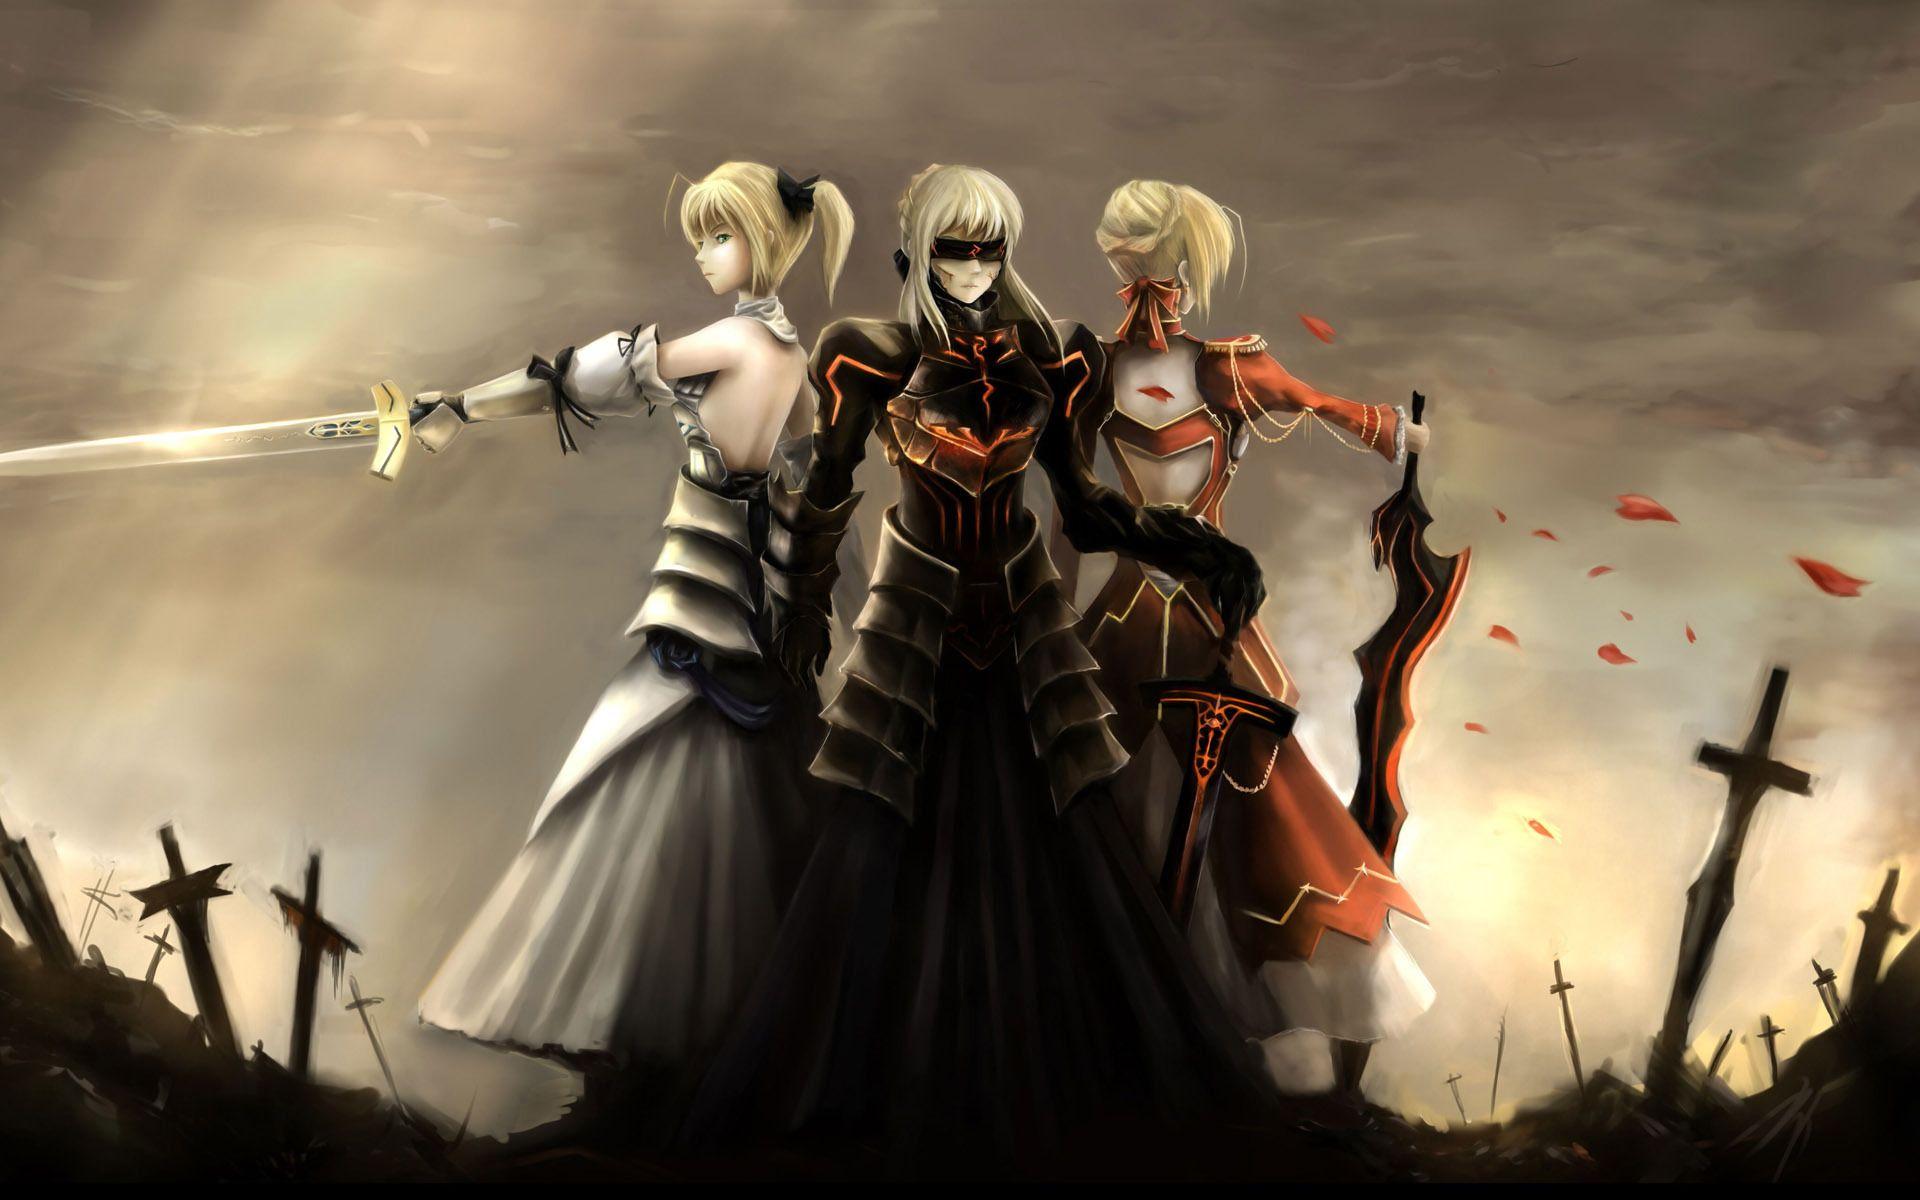 Image Result For Image Result For Fate Anime K Wallpaper